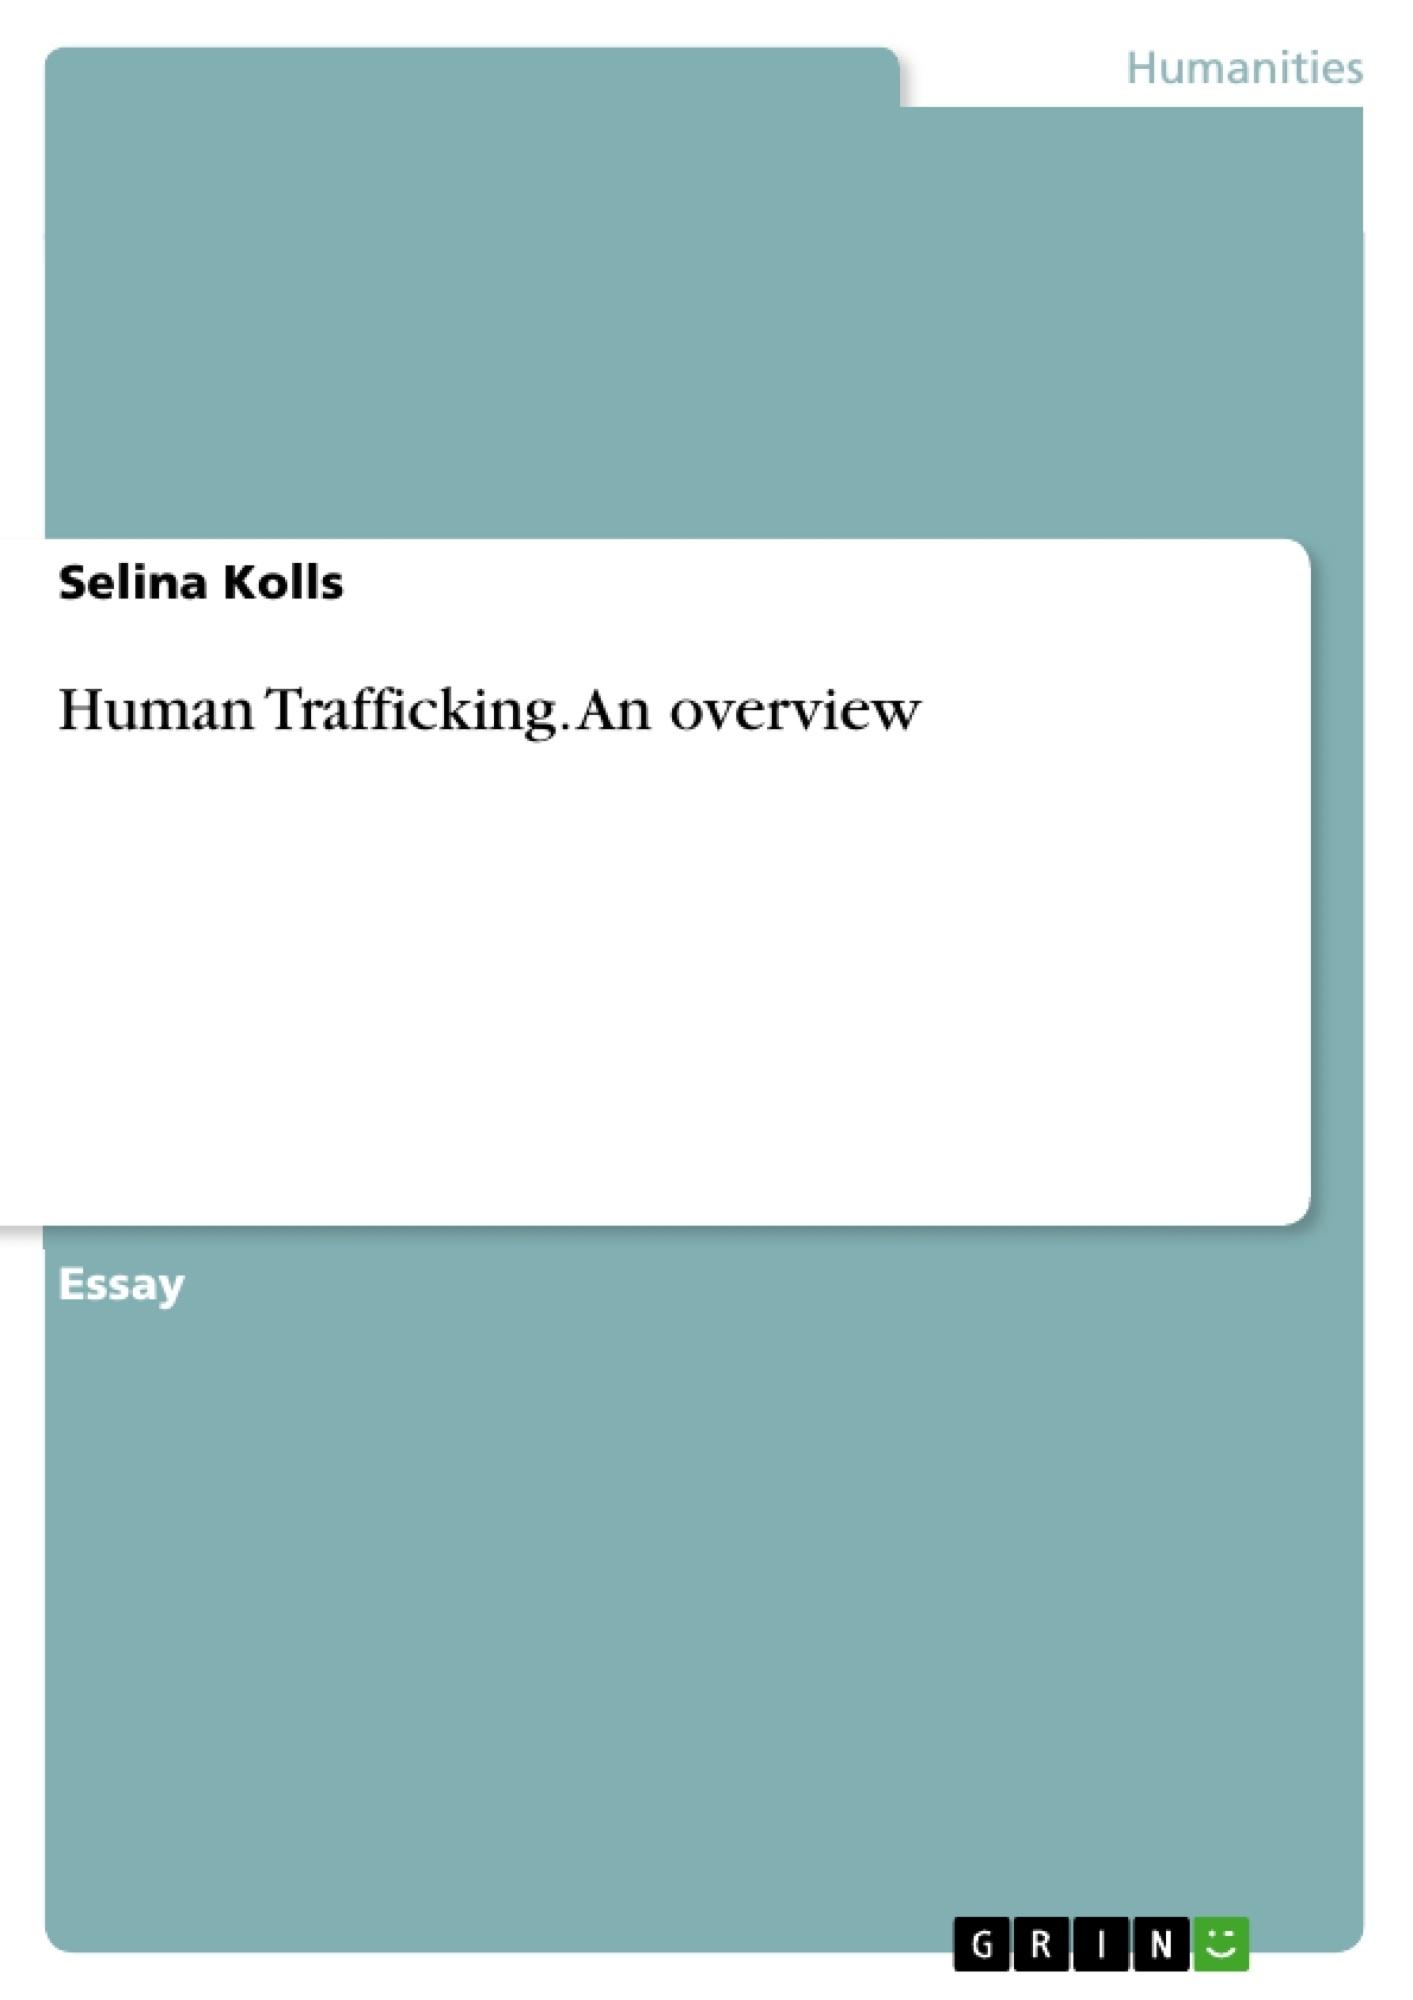 Title: Human Trafficking. An overview